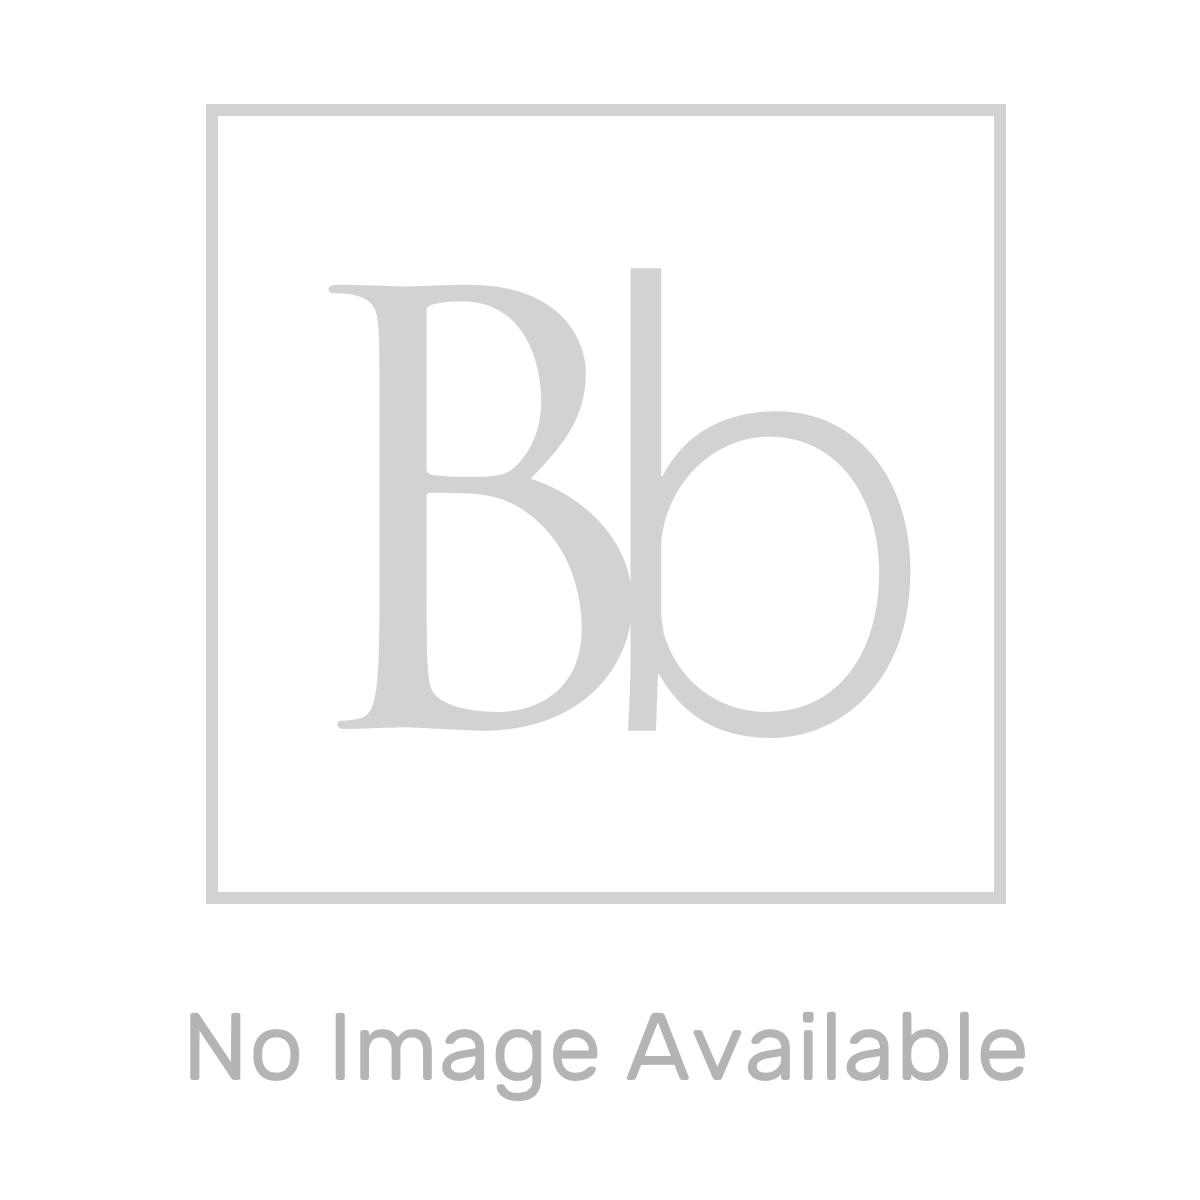 Aquadart Black Slate Shower Tray 1700 x 760 Overhead